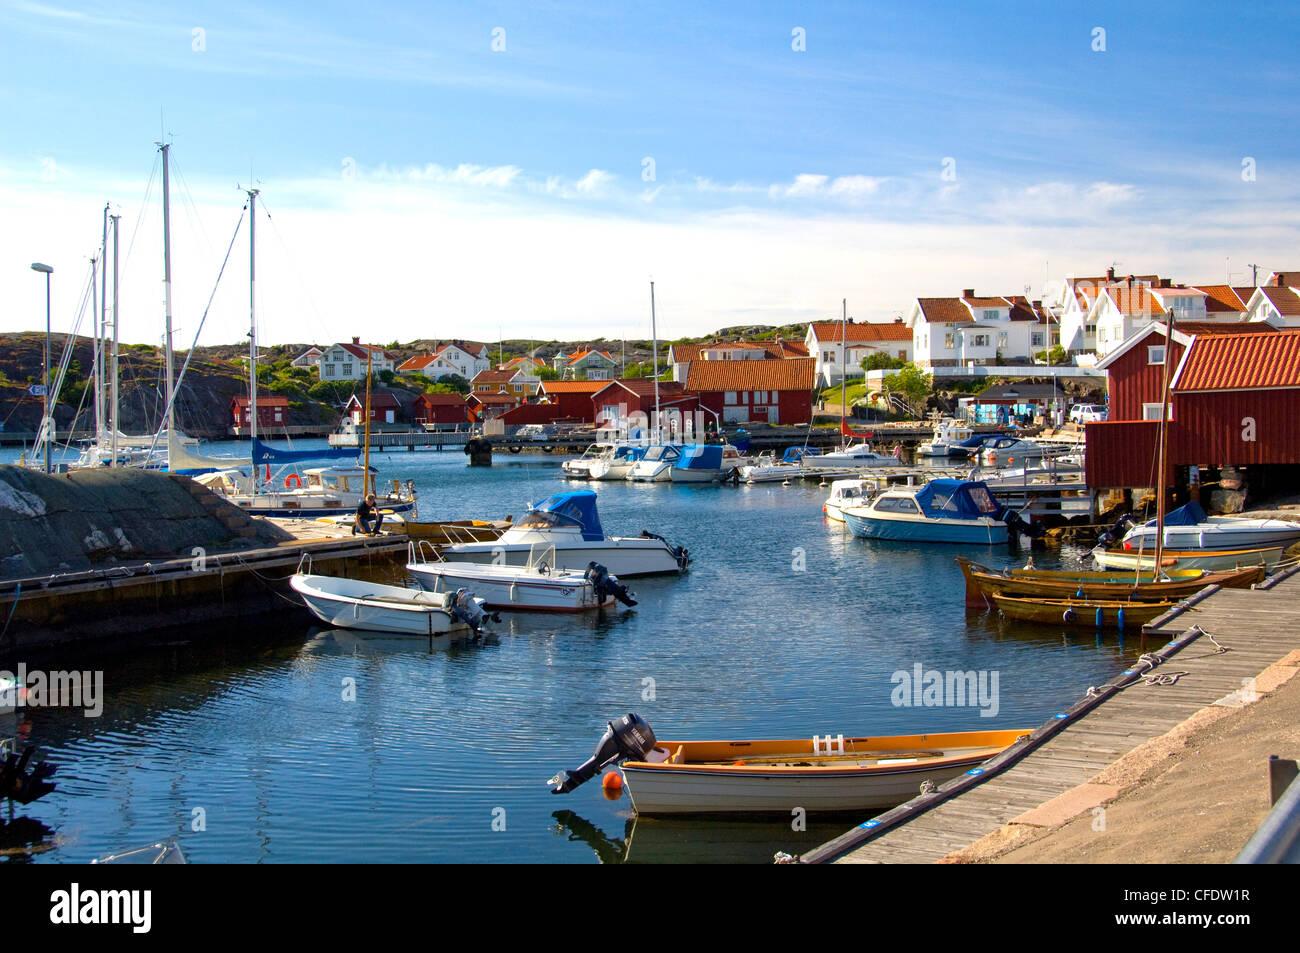 Harbour, Halleviksstrand, Stocken, Orust Island, West Gotaland, Sweden, Scandinavia, Europe - Stock Image